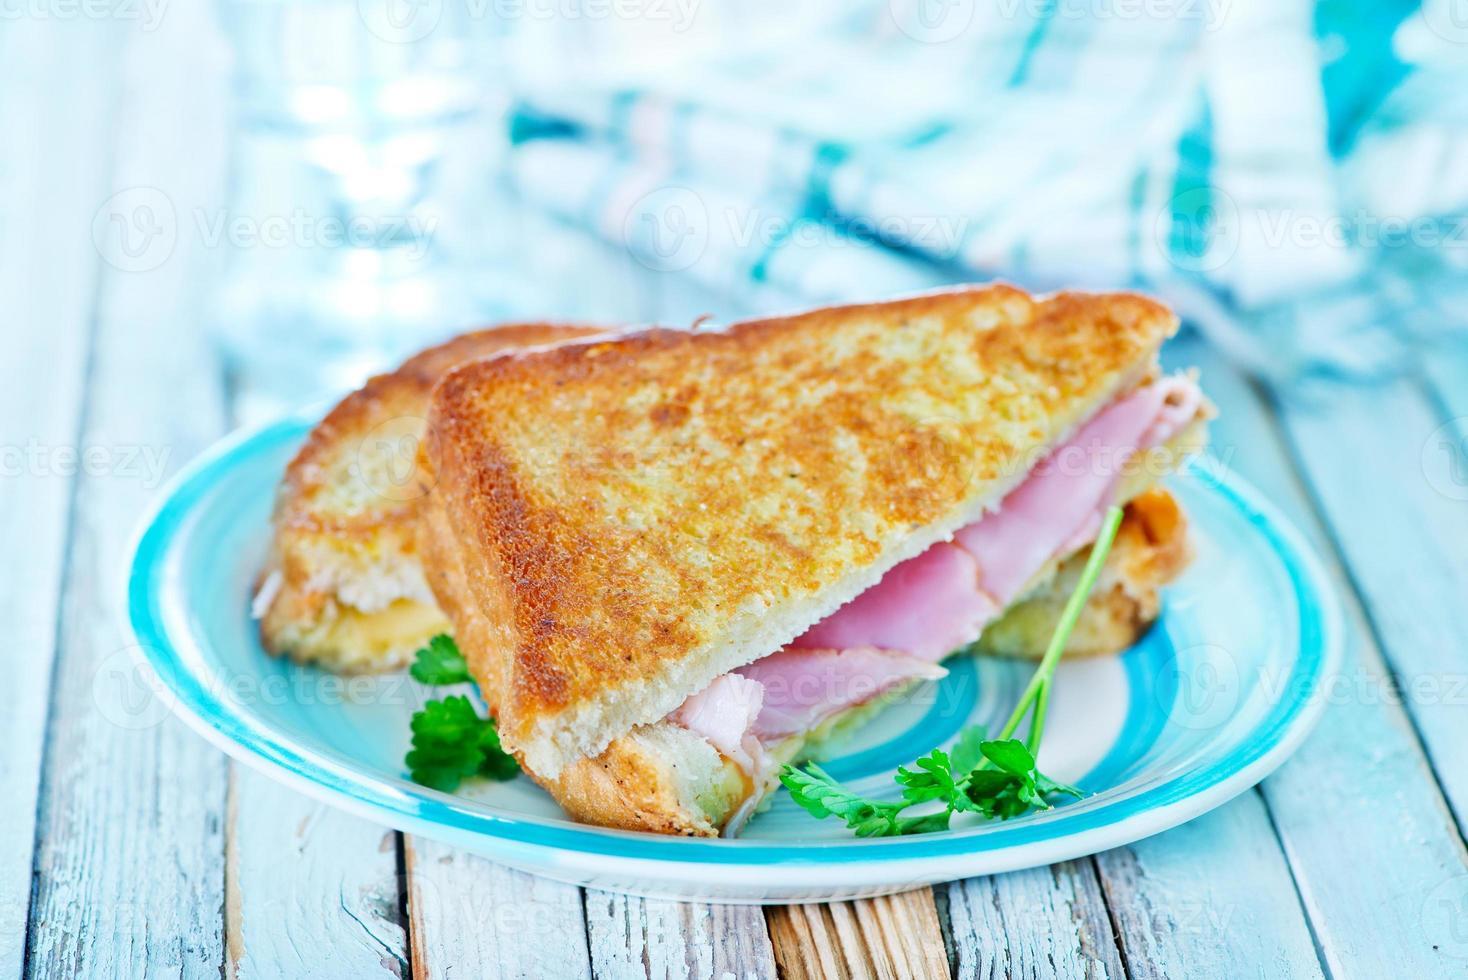 sanduíches foto